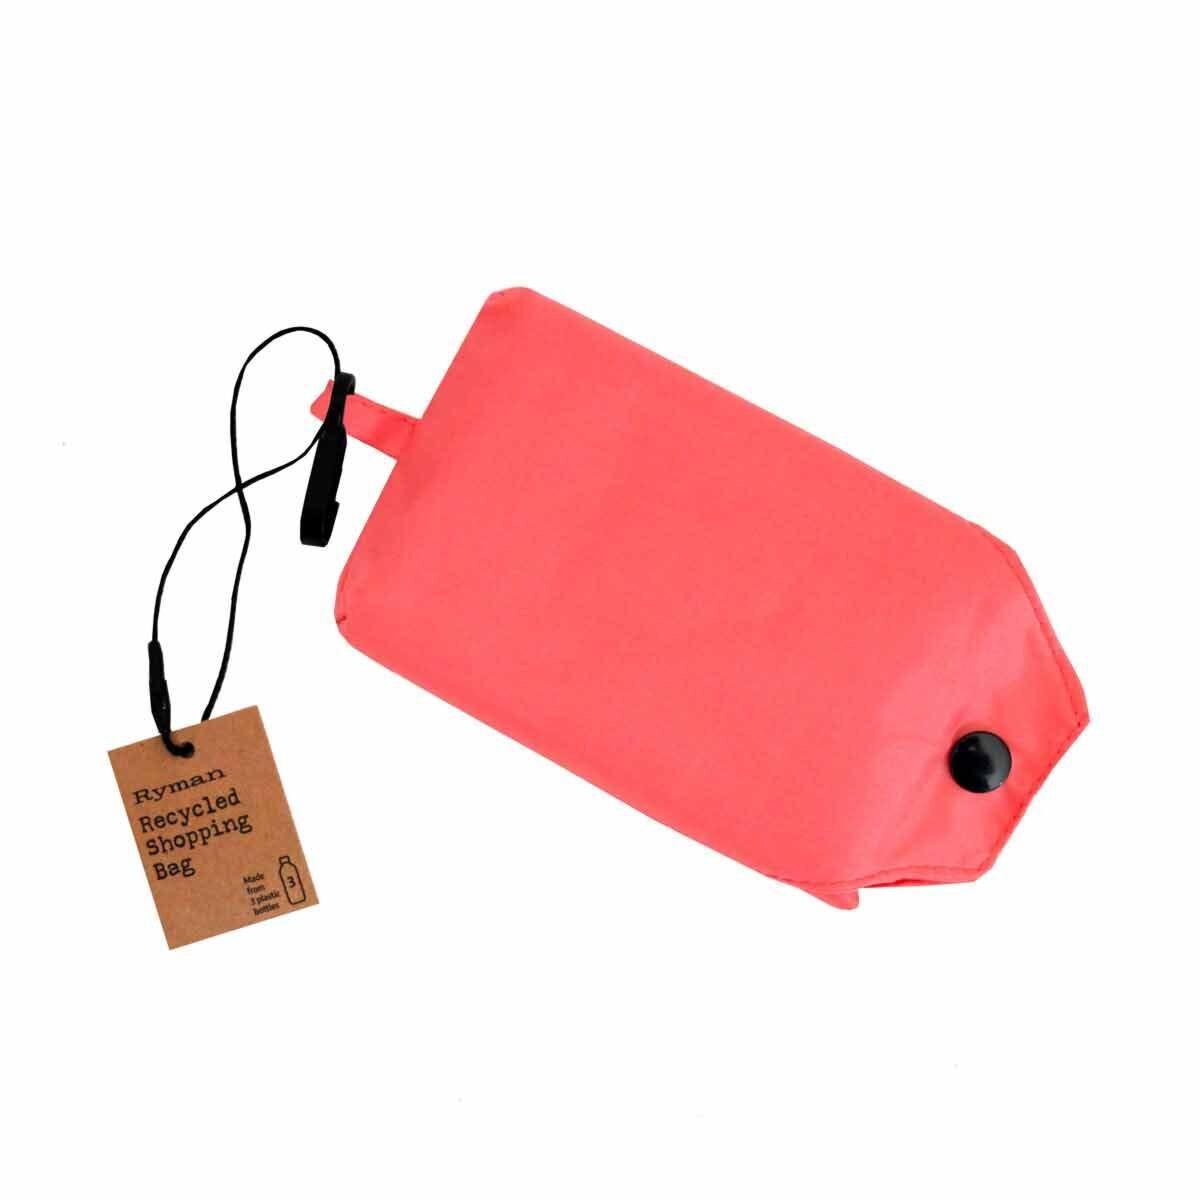 Ryman Reusable Foldaway Recycled Shopping Bag